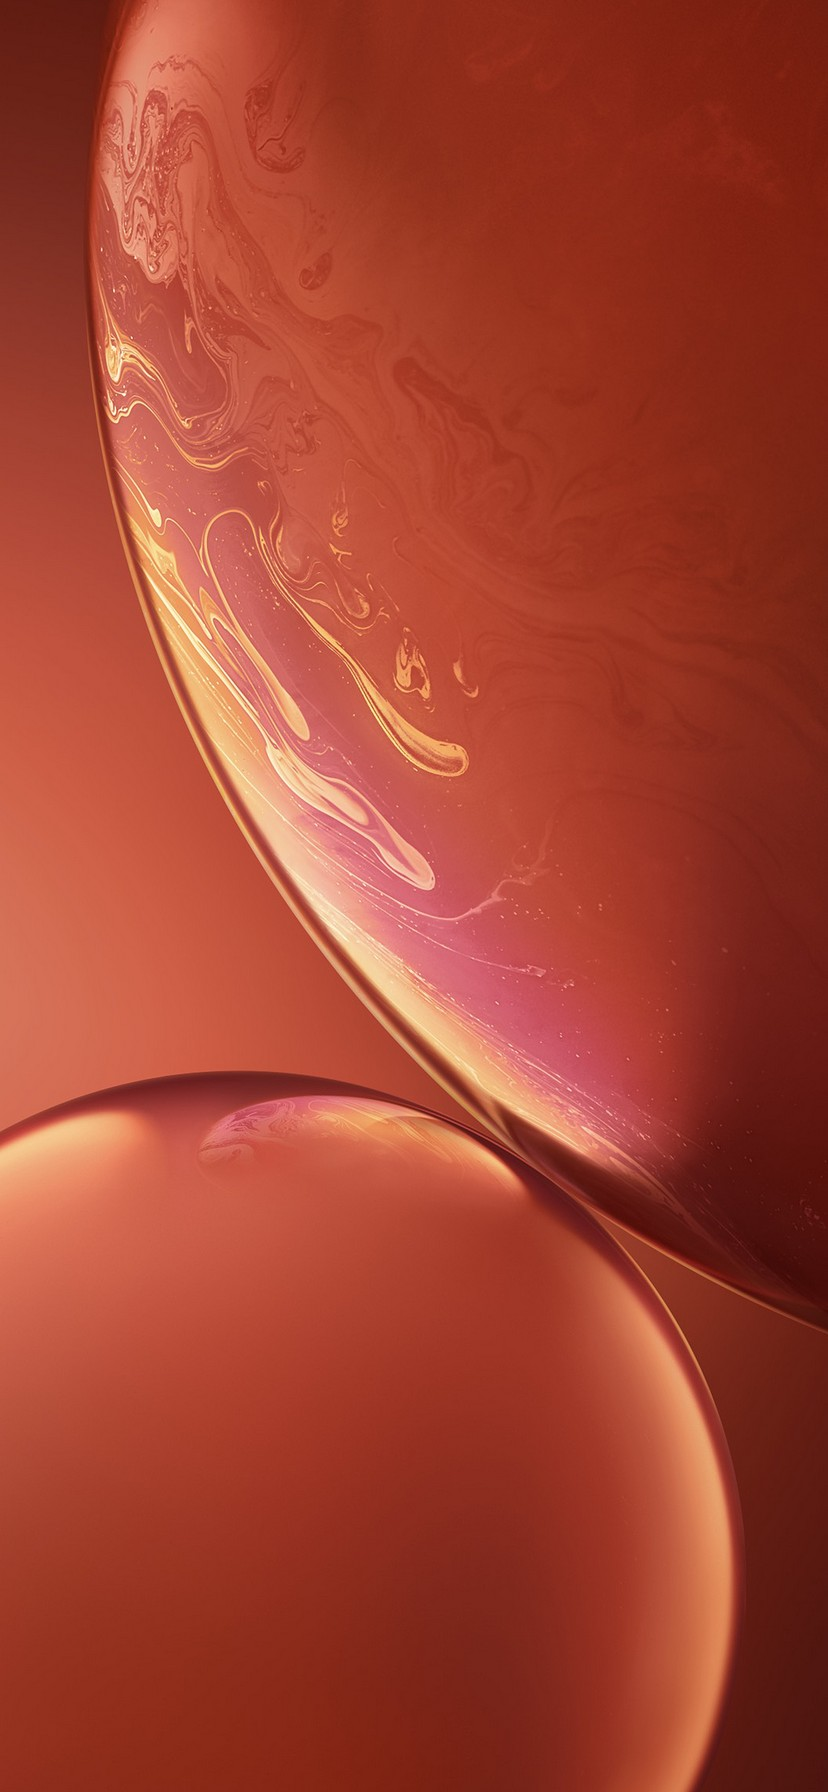 Iphone Xr Wallpaper High Quality With High resolution   Hình Nền ...